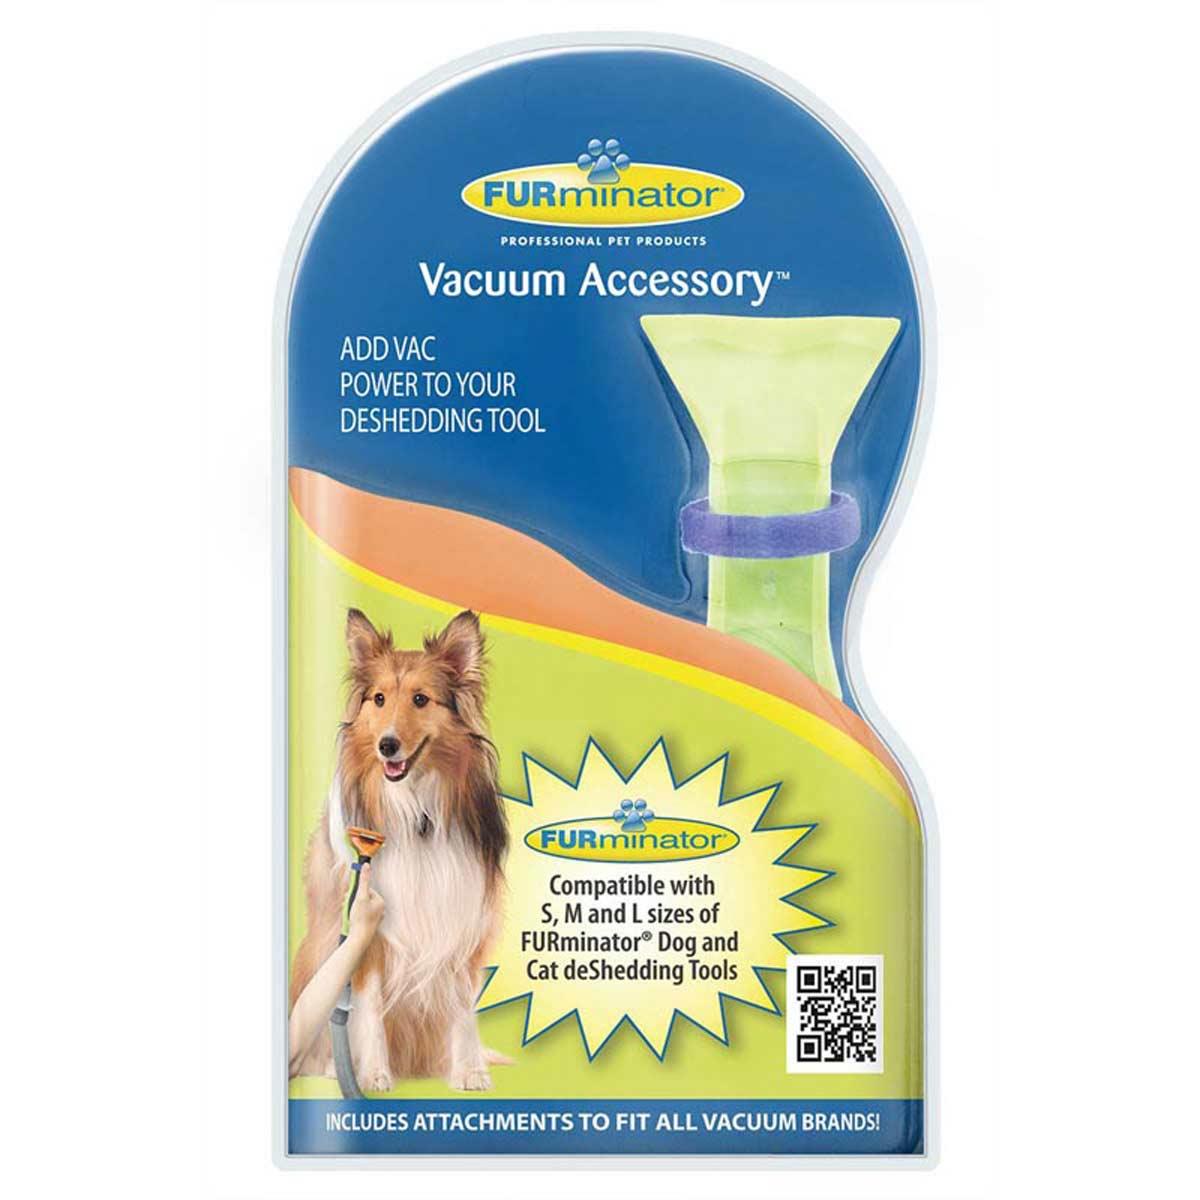 Furminator Vacuum Accessory in the Packaging